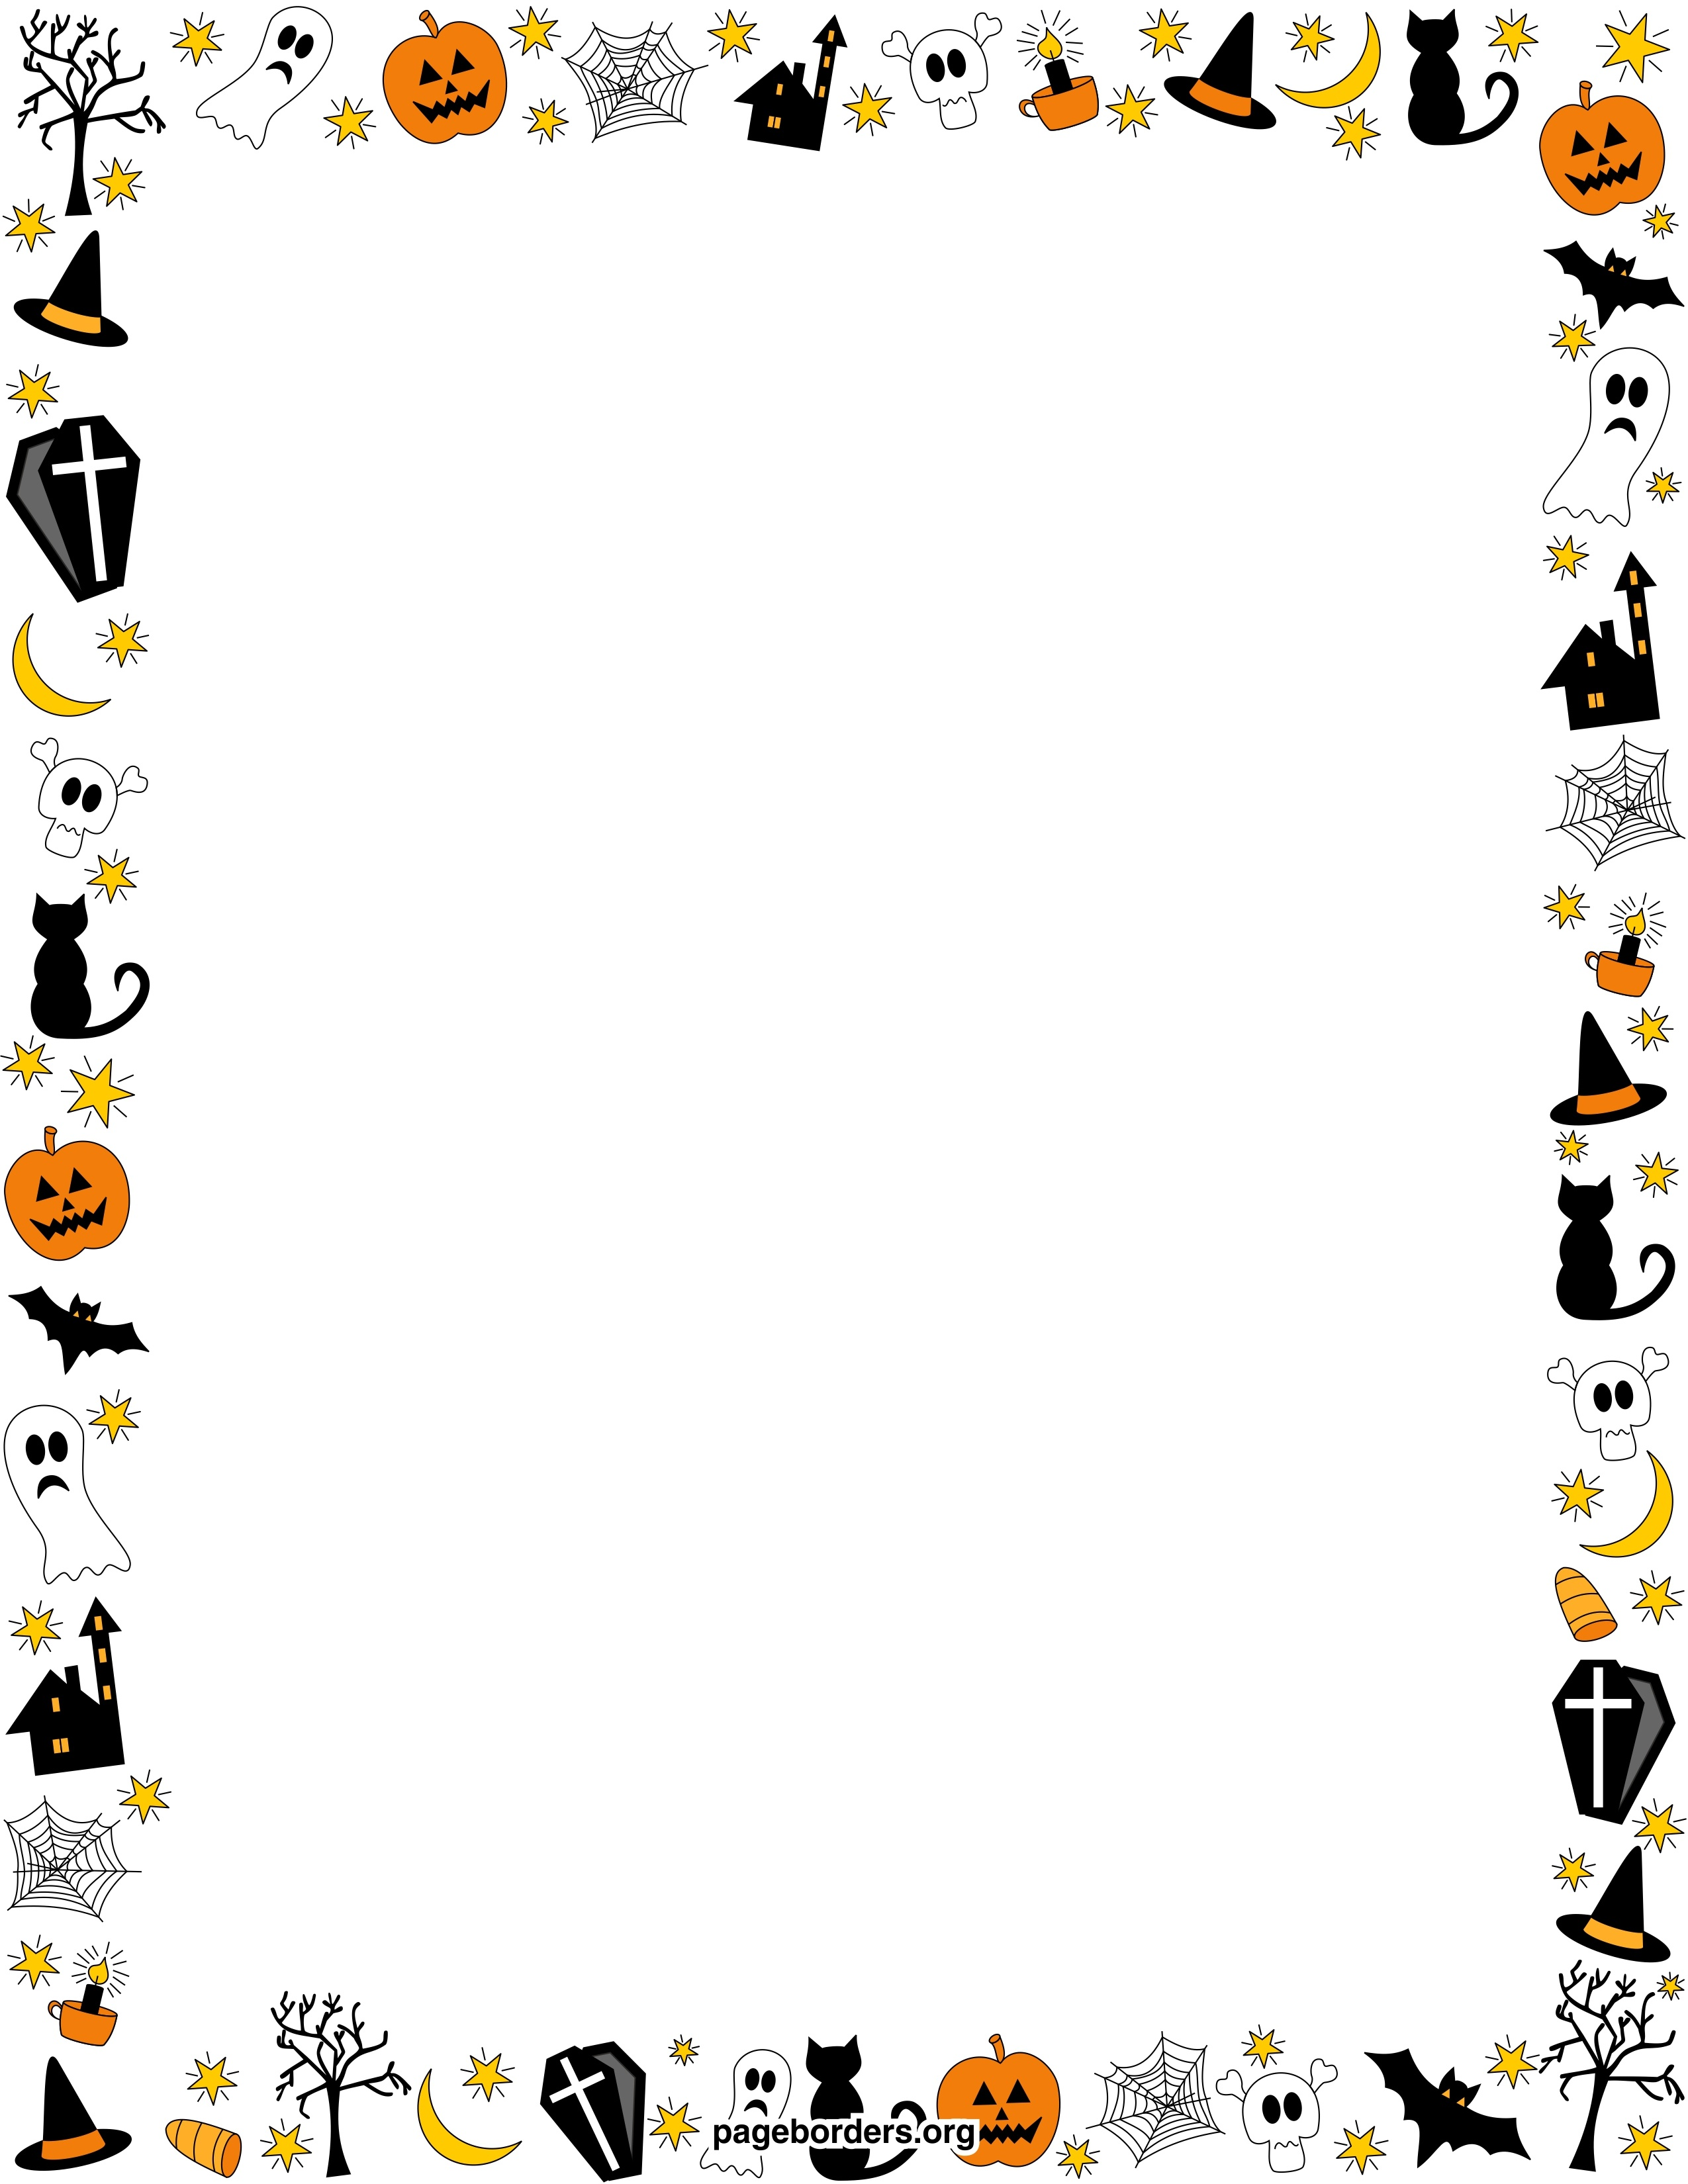 Free Free Halloween Borders, Download Free Clip Art, Free Clip Art - Free Printable Halloween Stationery Borders